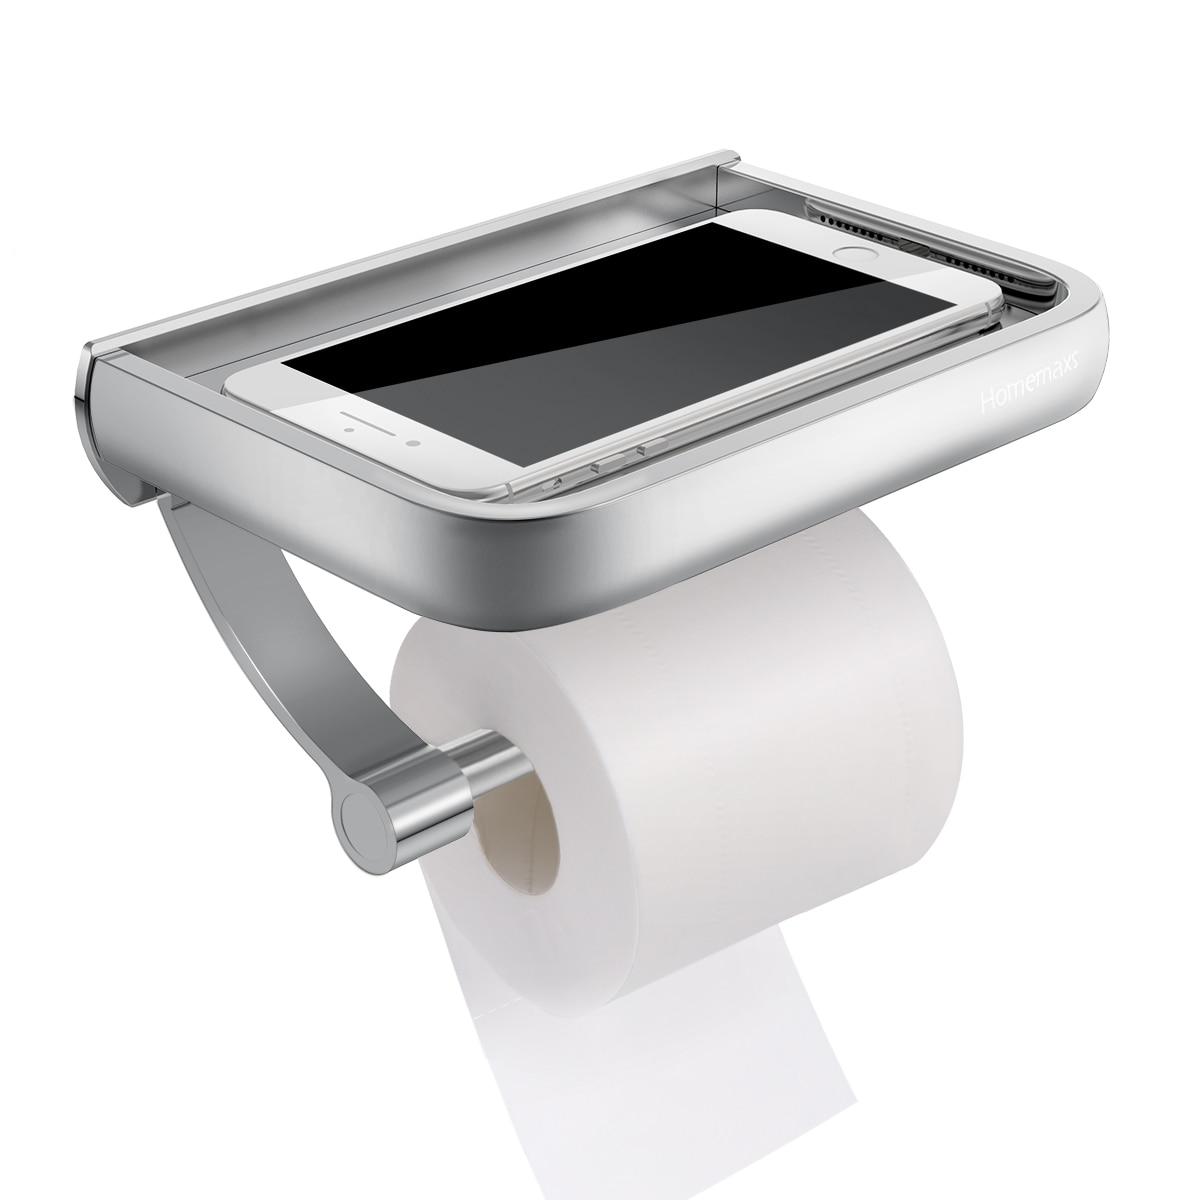 HOMEMAXS Wall Mount Toilet Paper Holder Aluminum Tissue Paper Holder Toilet Roll Dispenser With Phone Storage Shelf For Bathroom